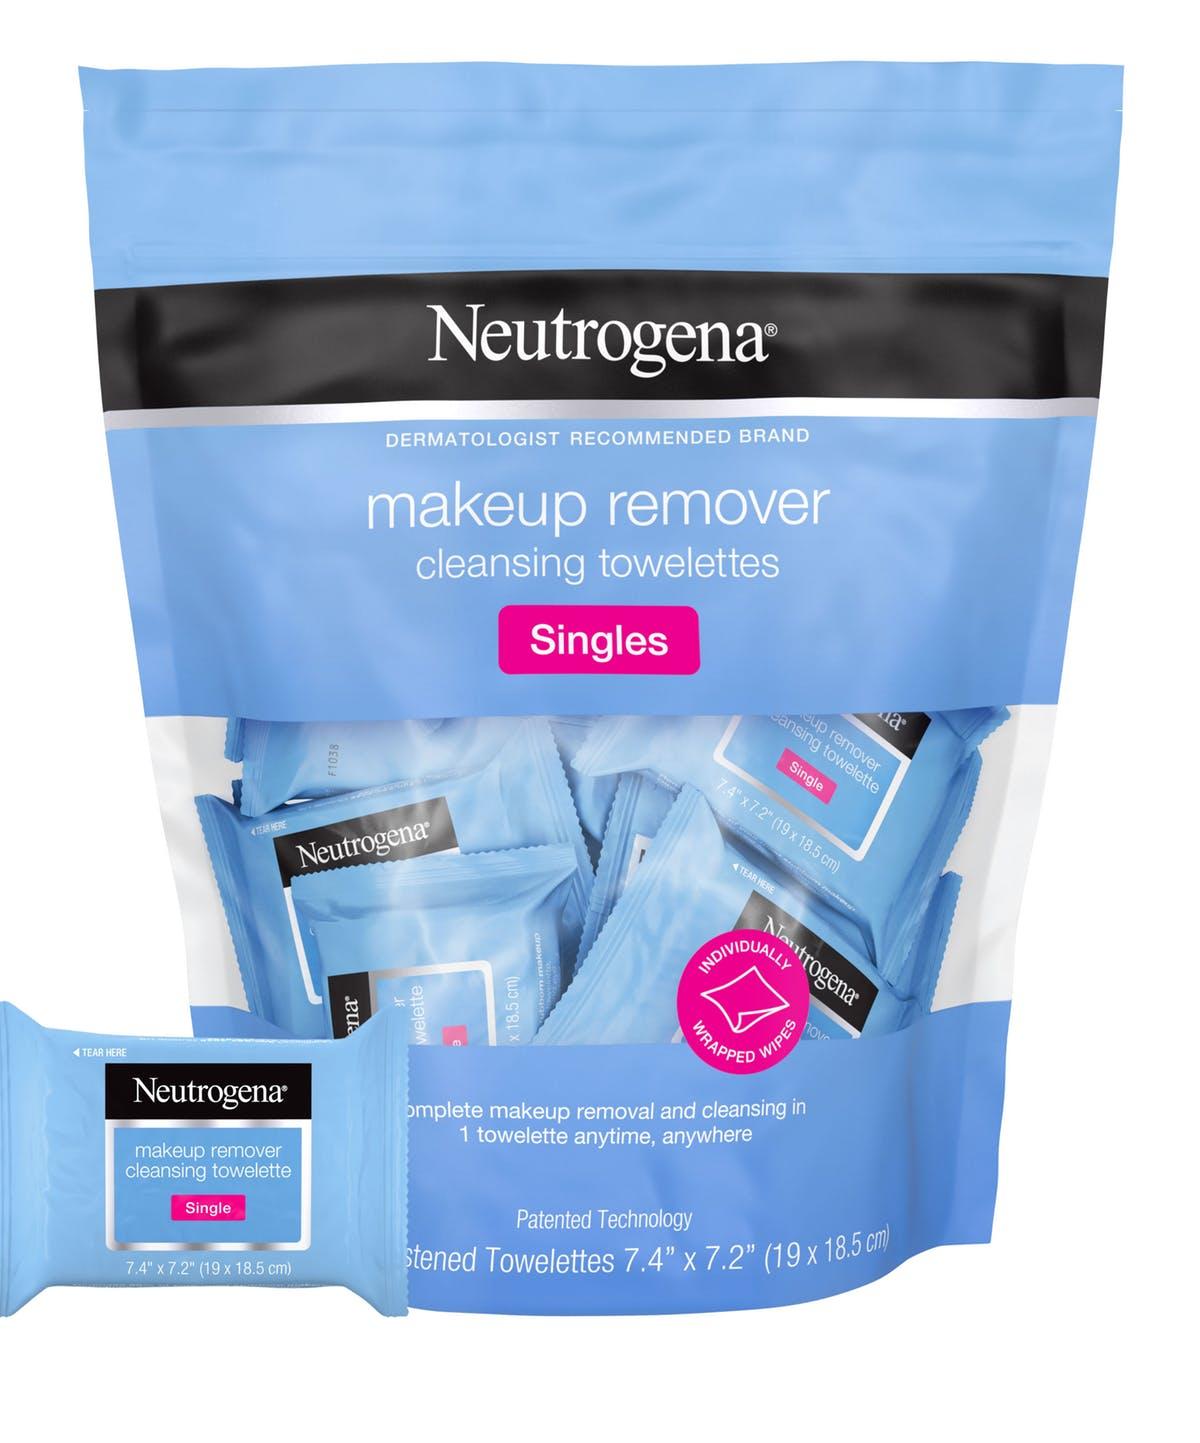 New Neutrogena makeup remover that impressed us